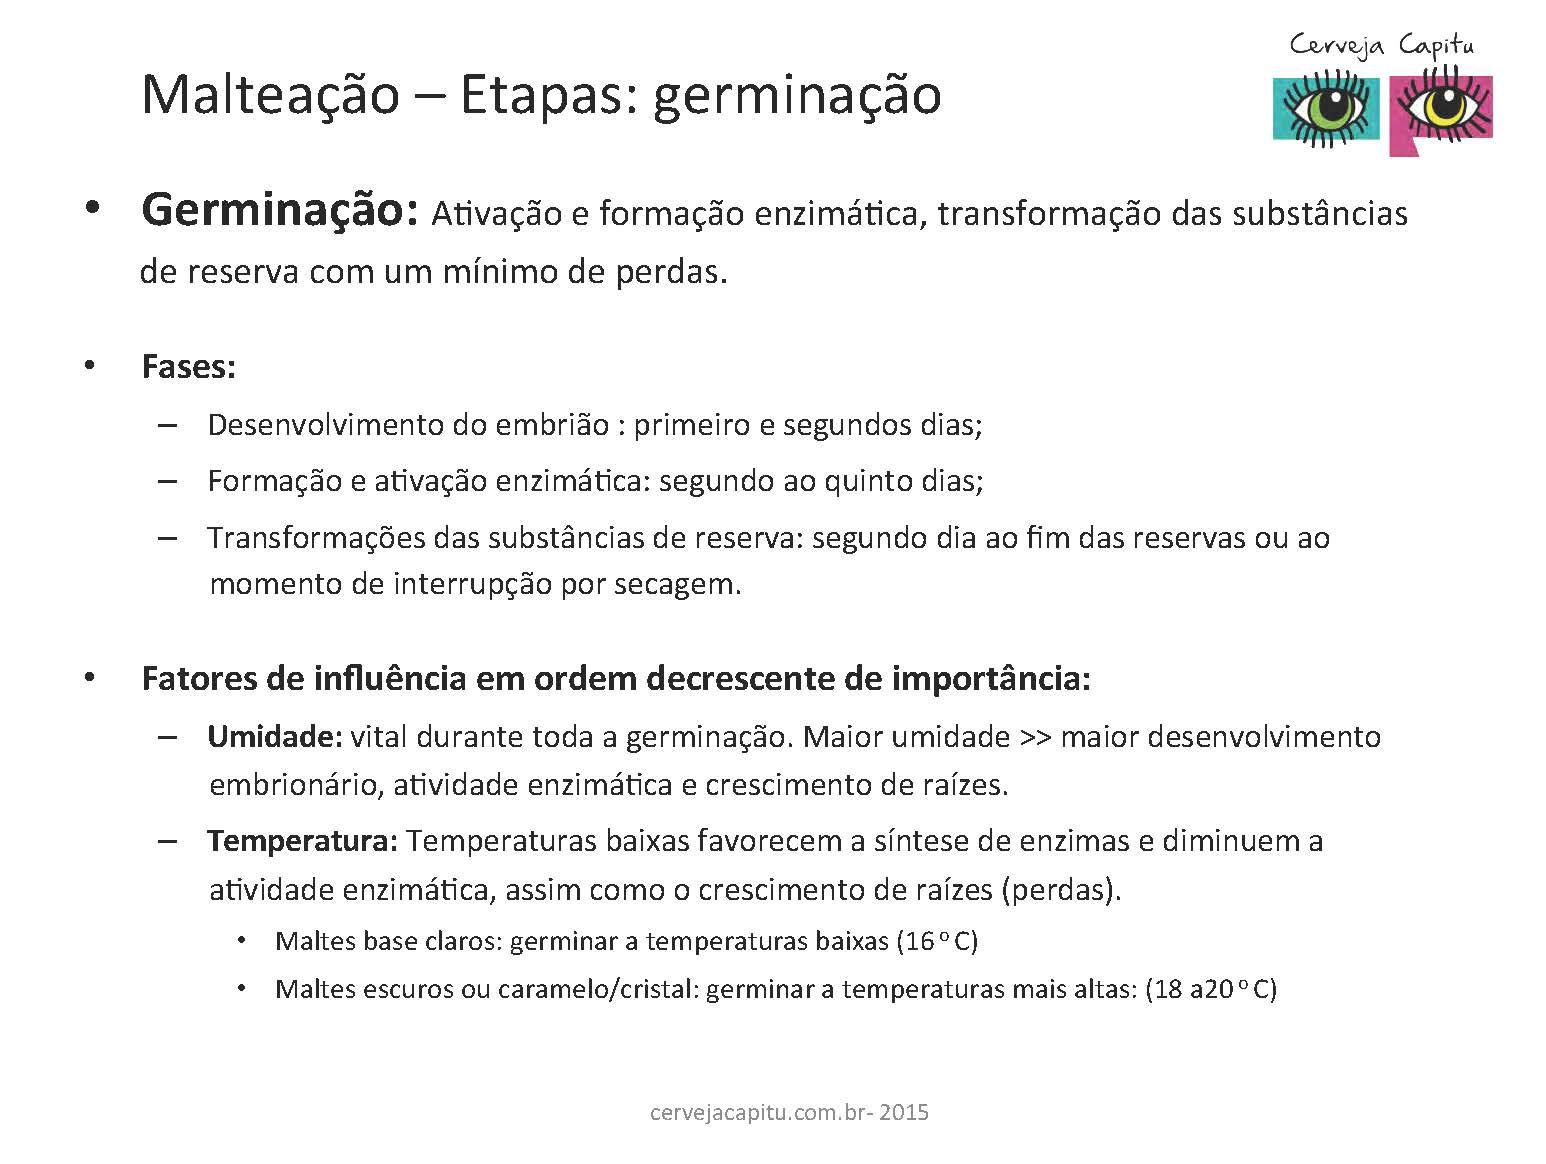 Princípios da Malteação_Capitu_SM_Page_06.jpg